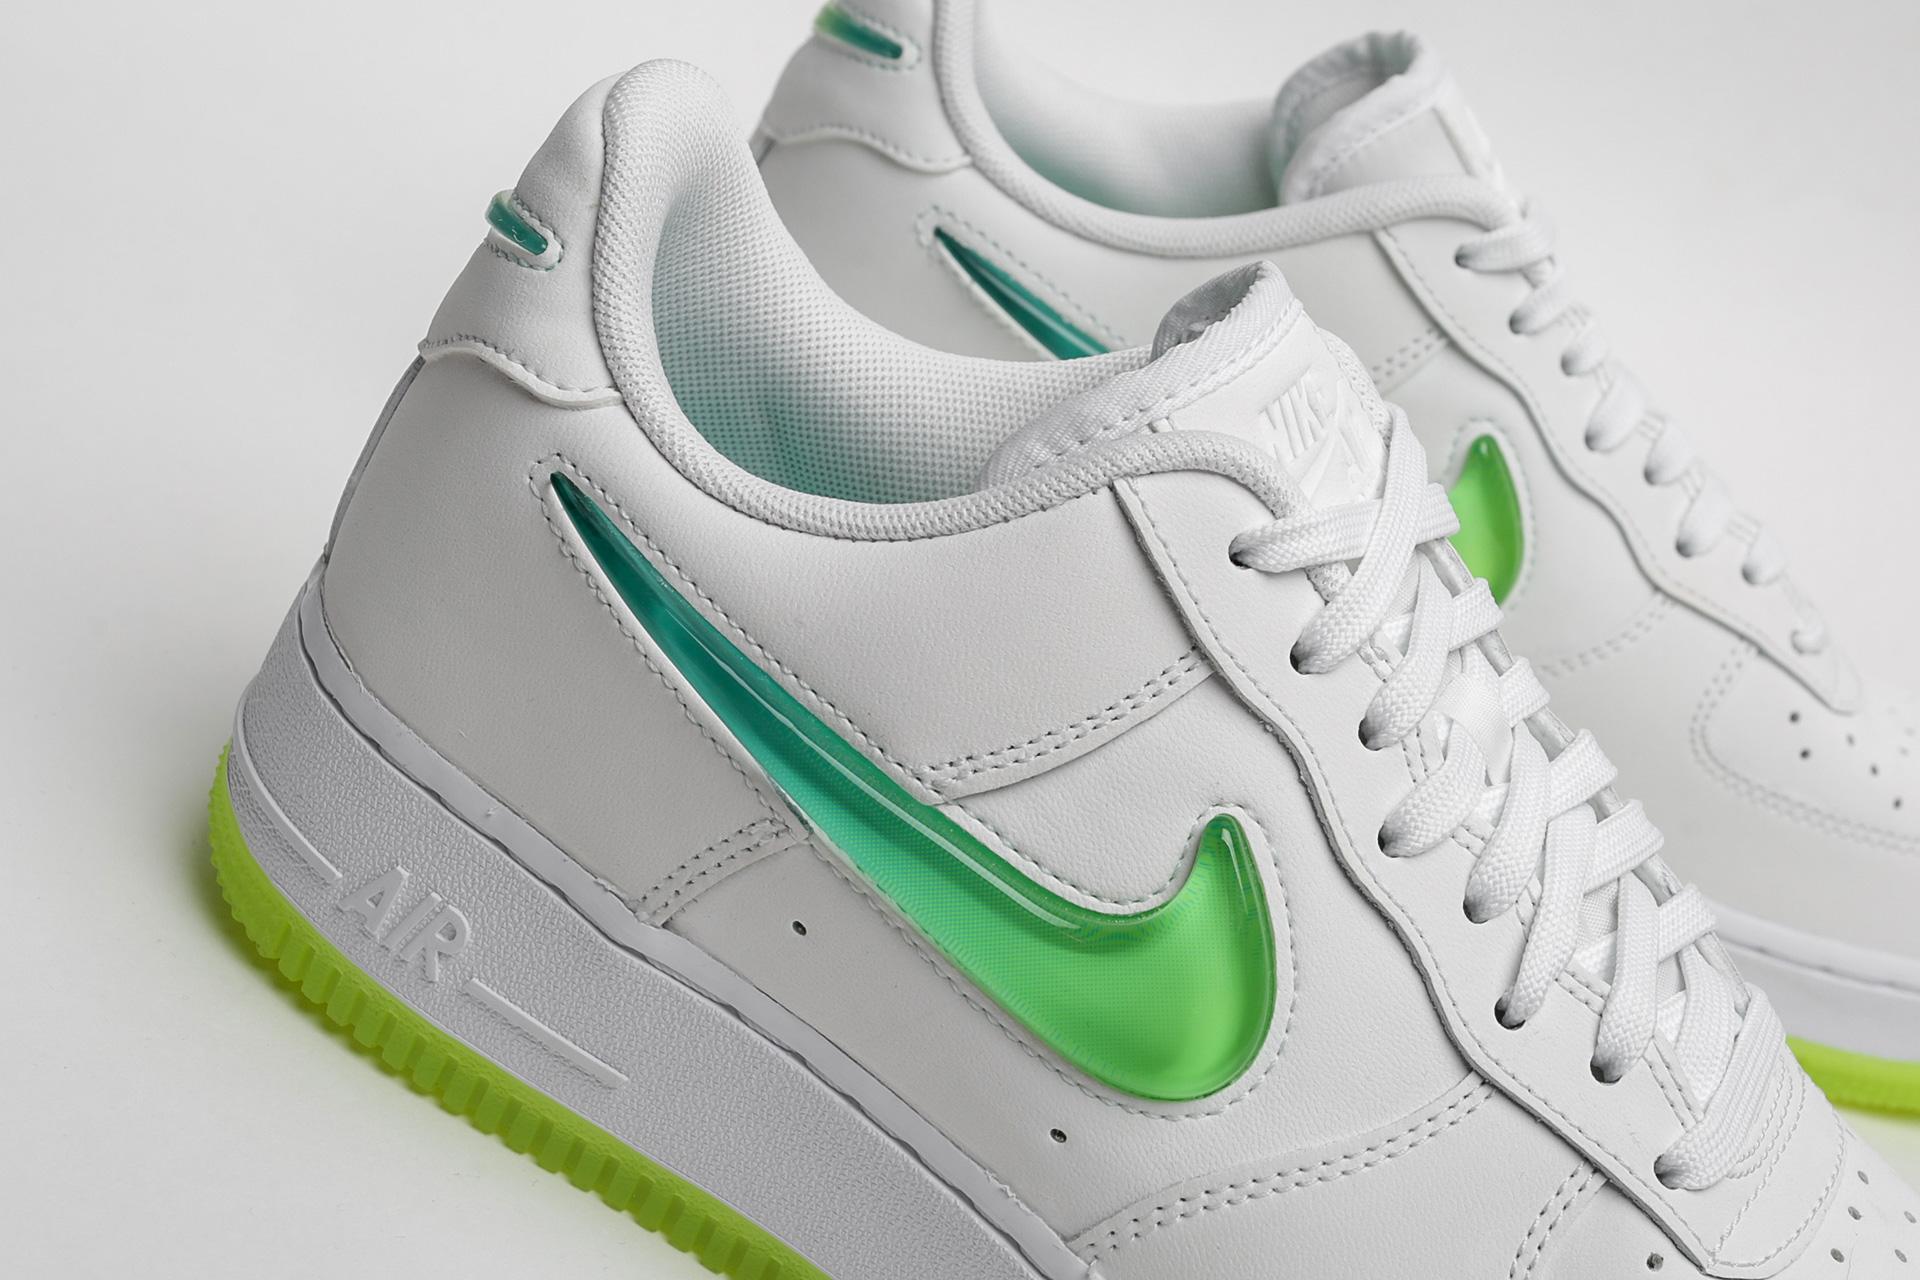 e32393b5 ... Купить мужские белые кроссовки Nike Air Force 1 '07 PRM 2 - фото 4  картинки ...